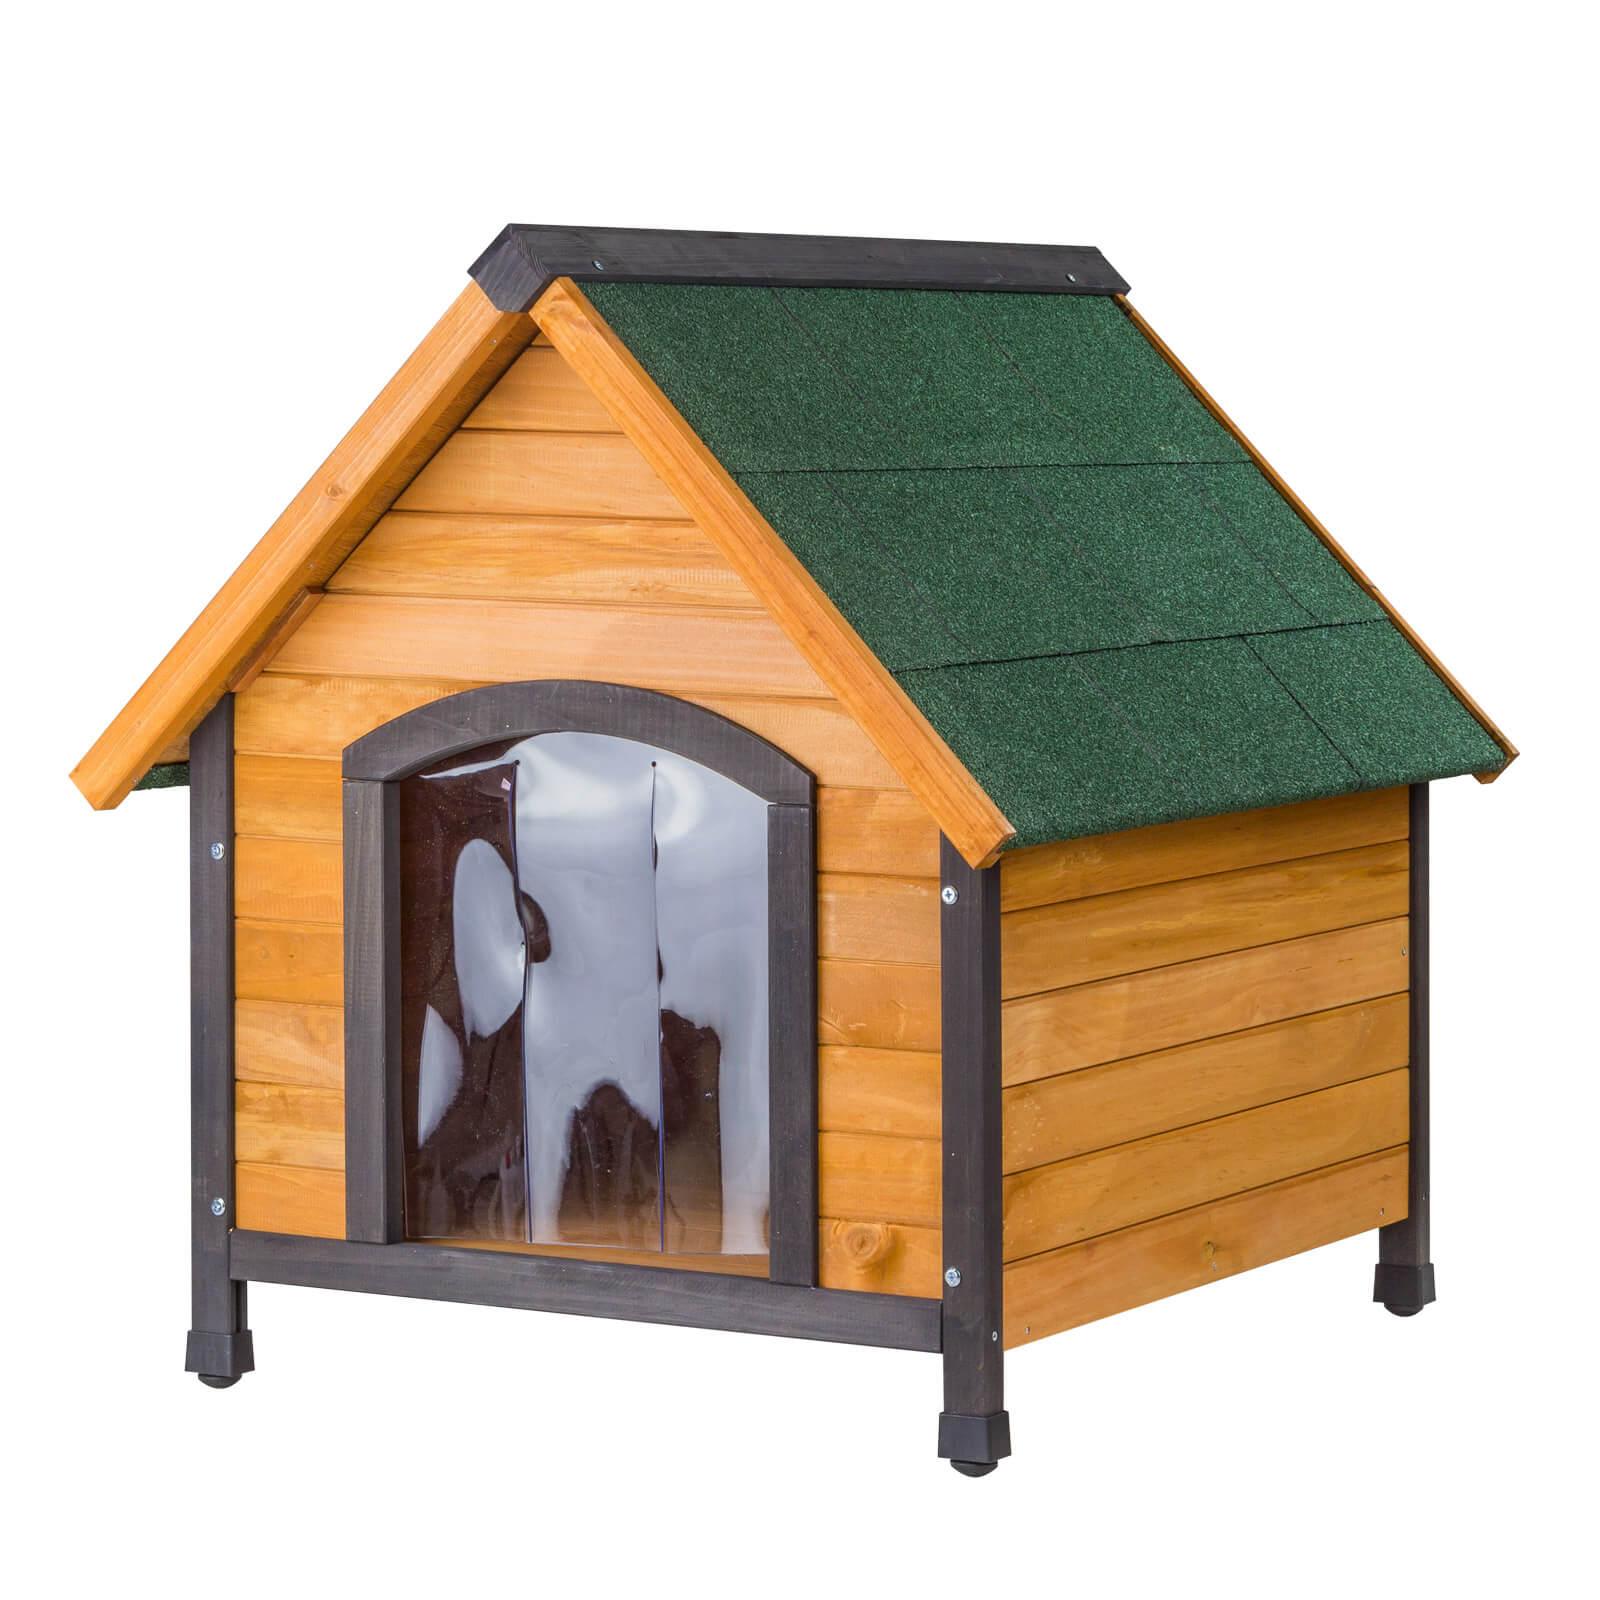 Dema Hundehütte / Hundehaus Lilly Holz Hütte 50065